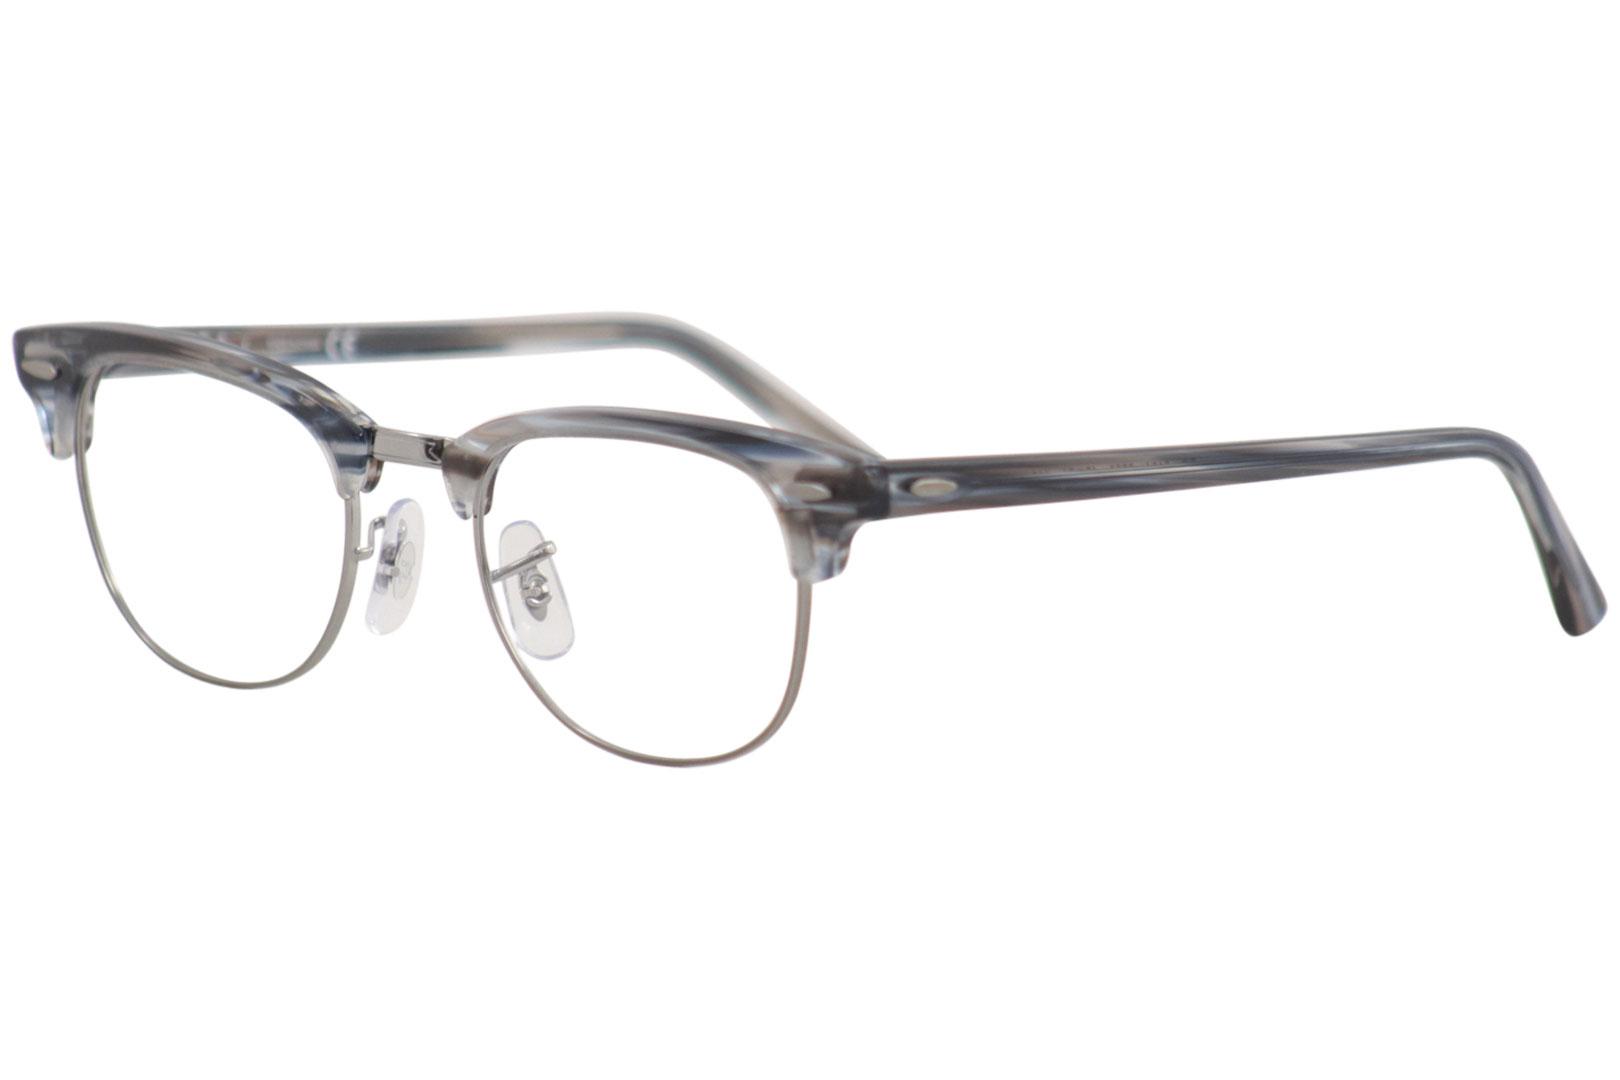 cd355da3672a1 Ray Ban Eyeglasses Clubmaster RB5154 RX 5154 5750 Blue RayBan ...